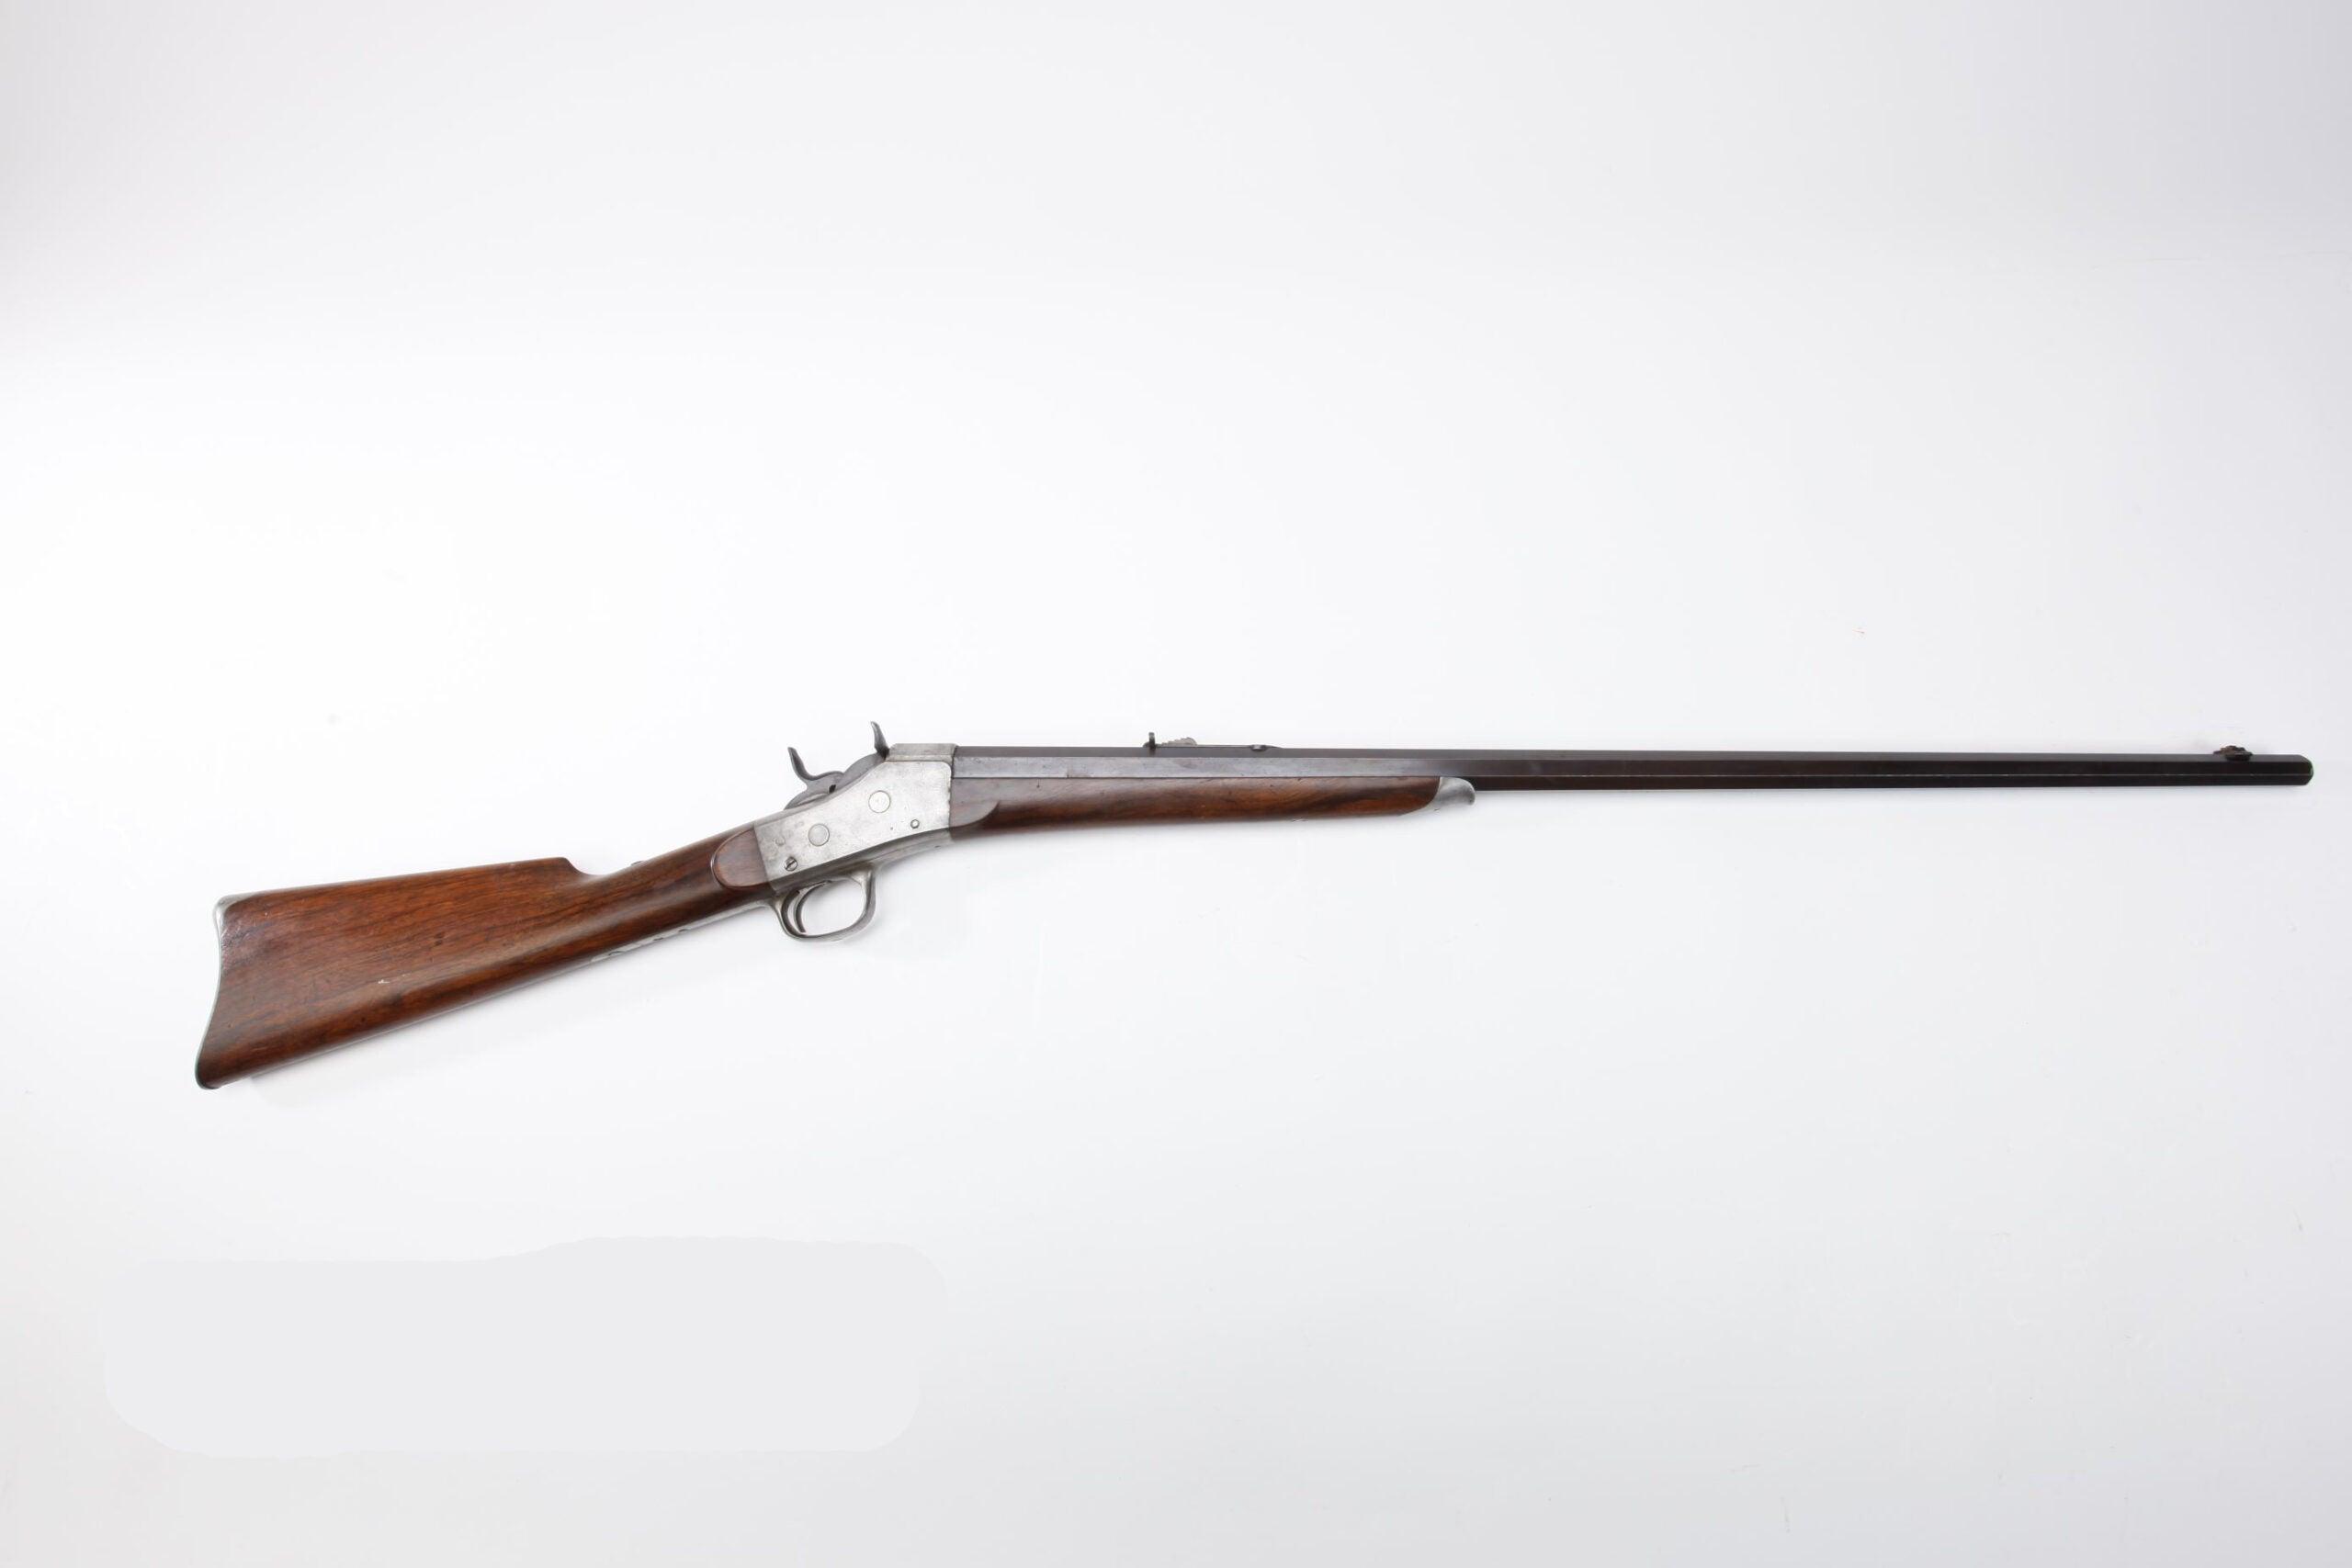 A Remington Arms Model 4 Rolling Block rifle.